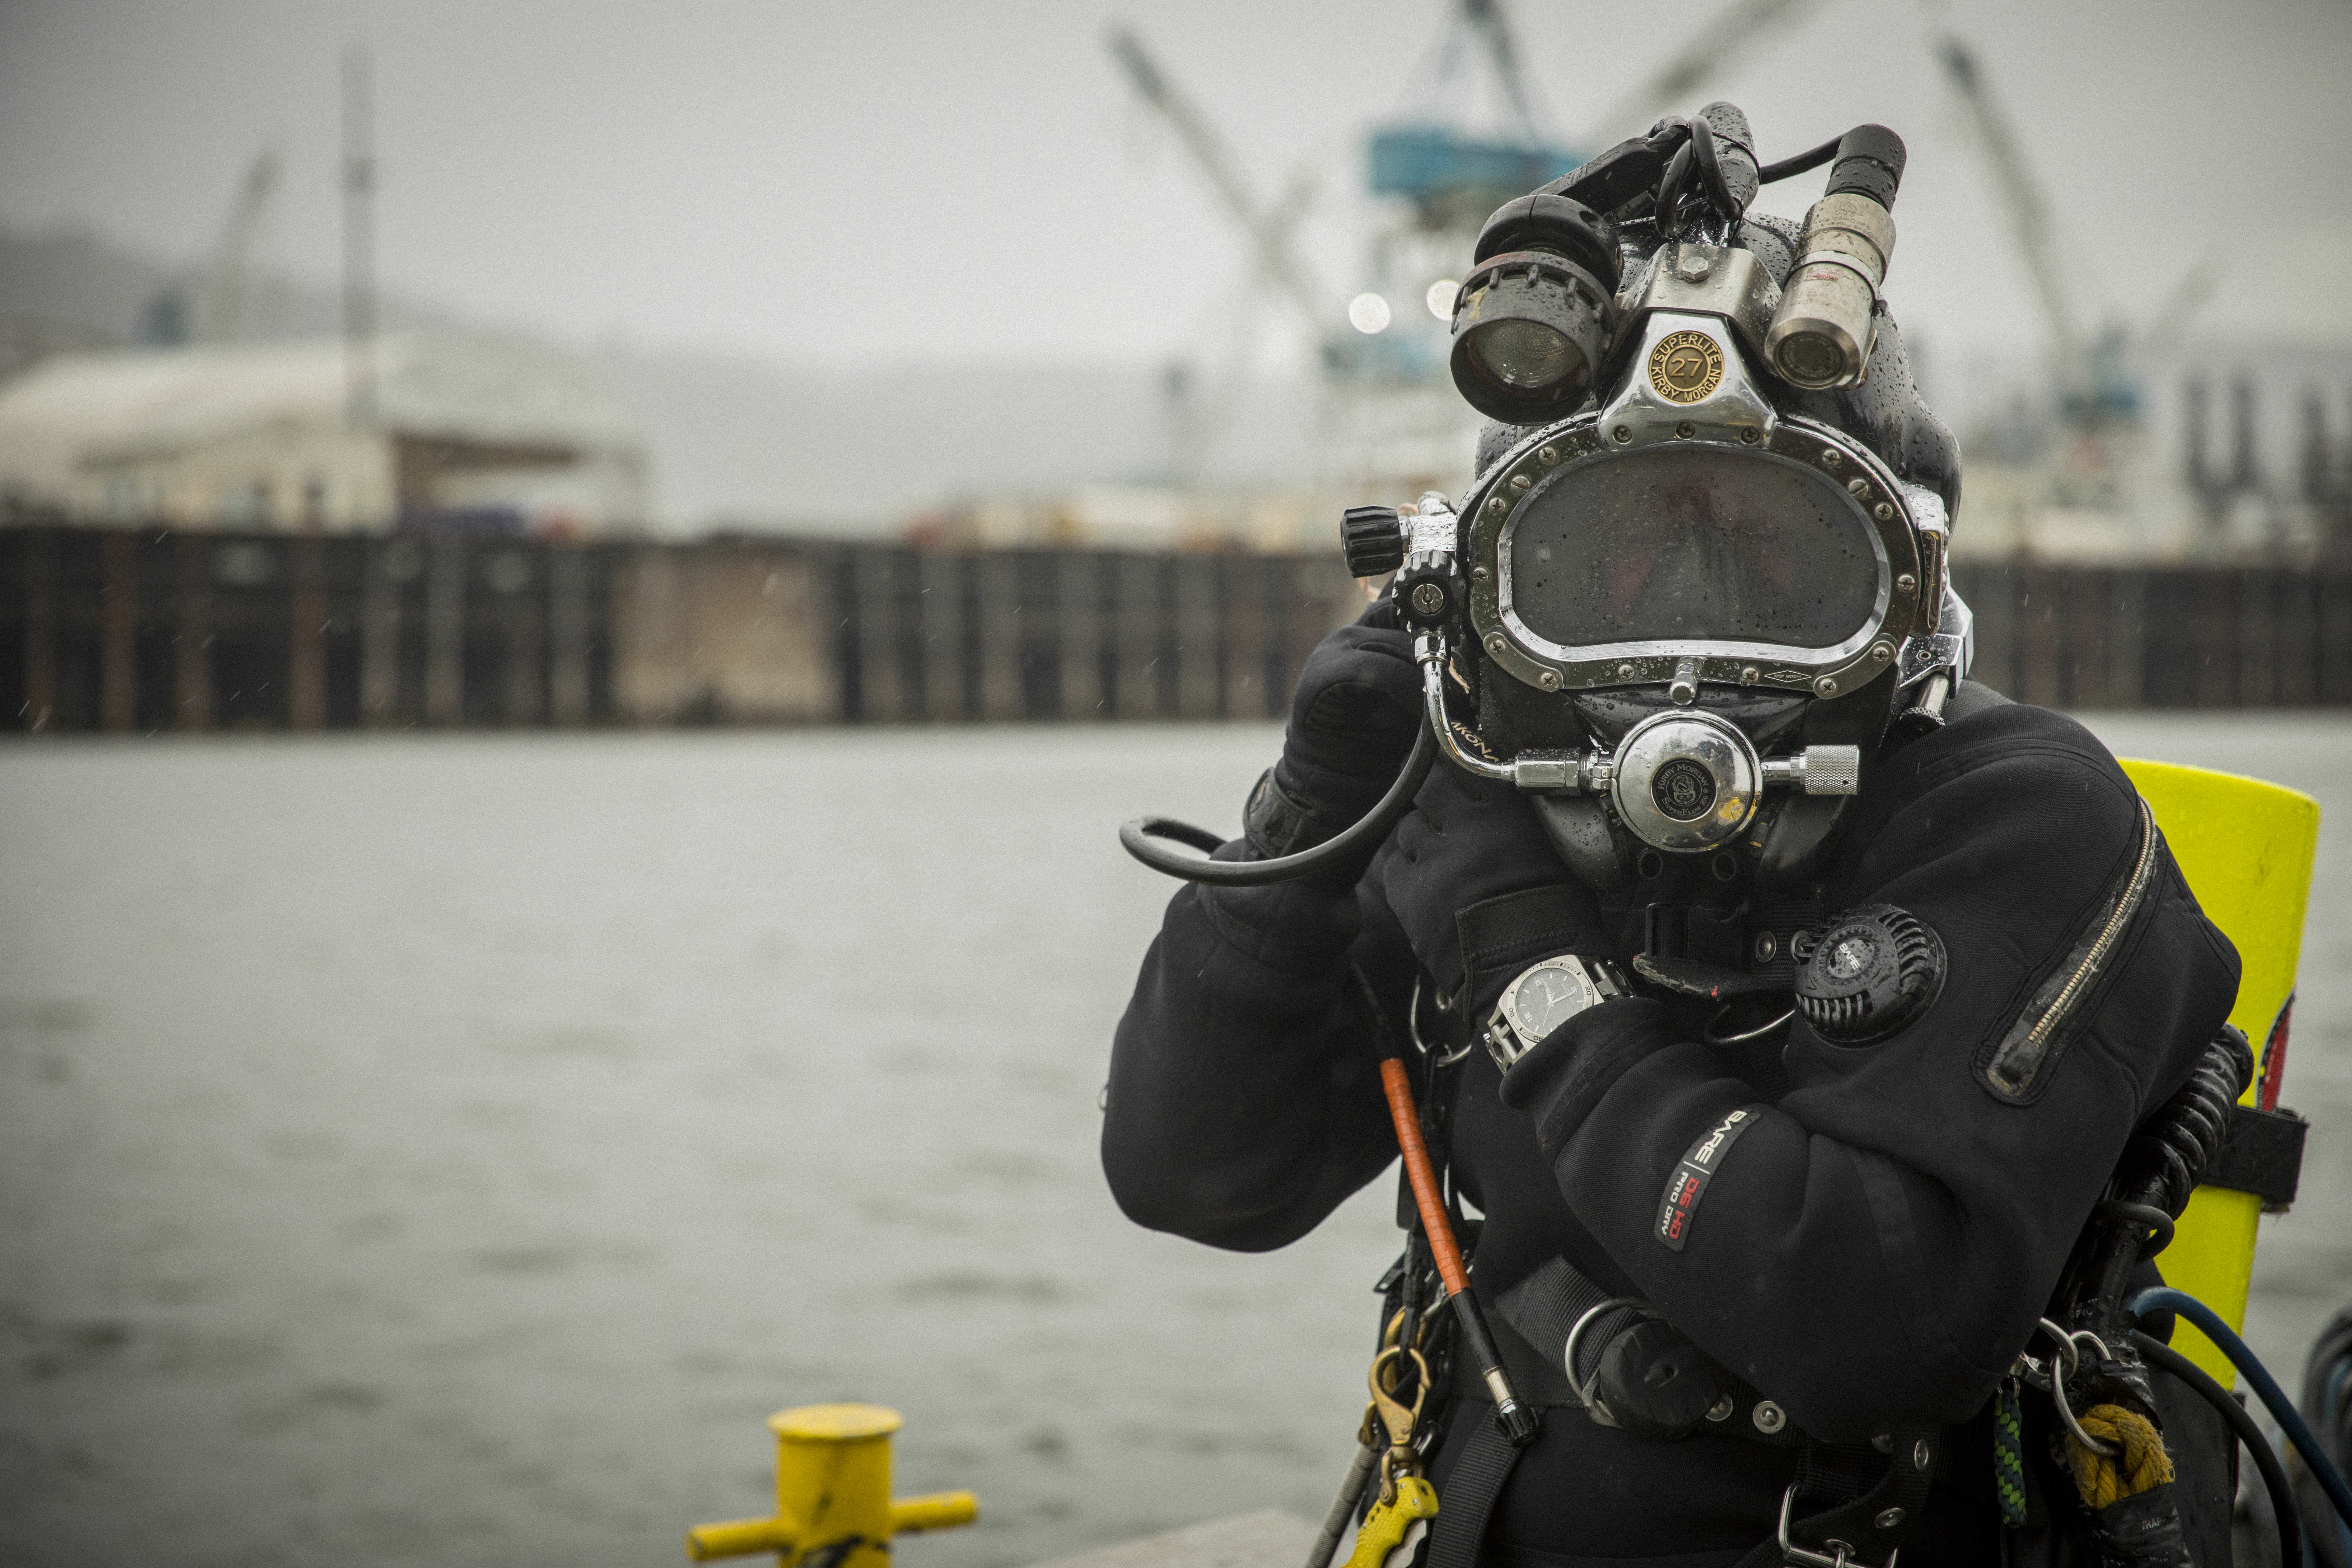 Scuba diver wearing Leatherman tread tempo multi-tool watch in silver